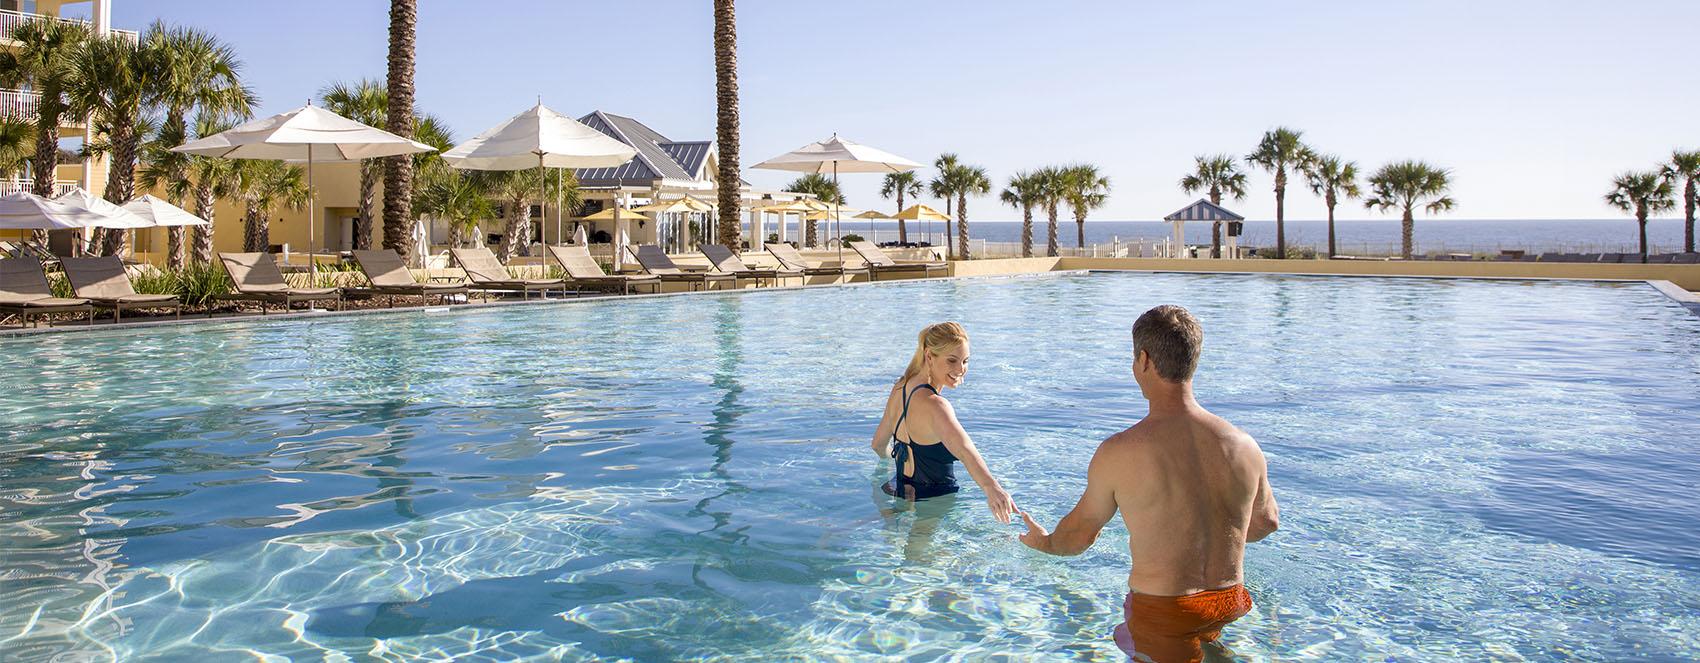 Amelia Resort ResortsOmni Resort Island Plantation Plantation ResortsOmni Amelia Island 7Yybf6g